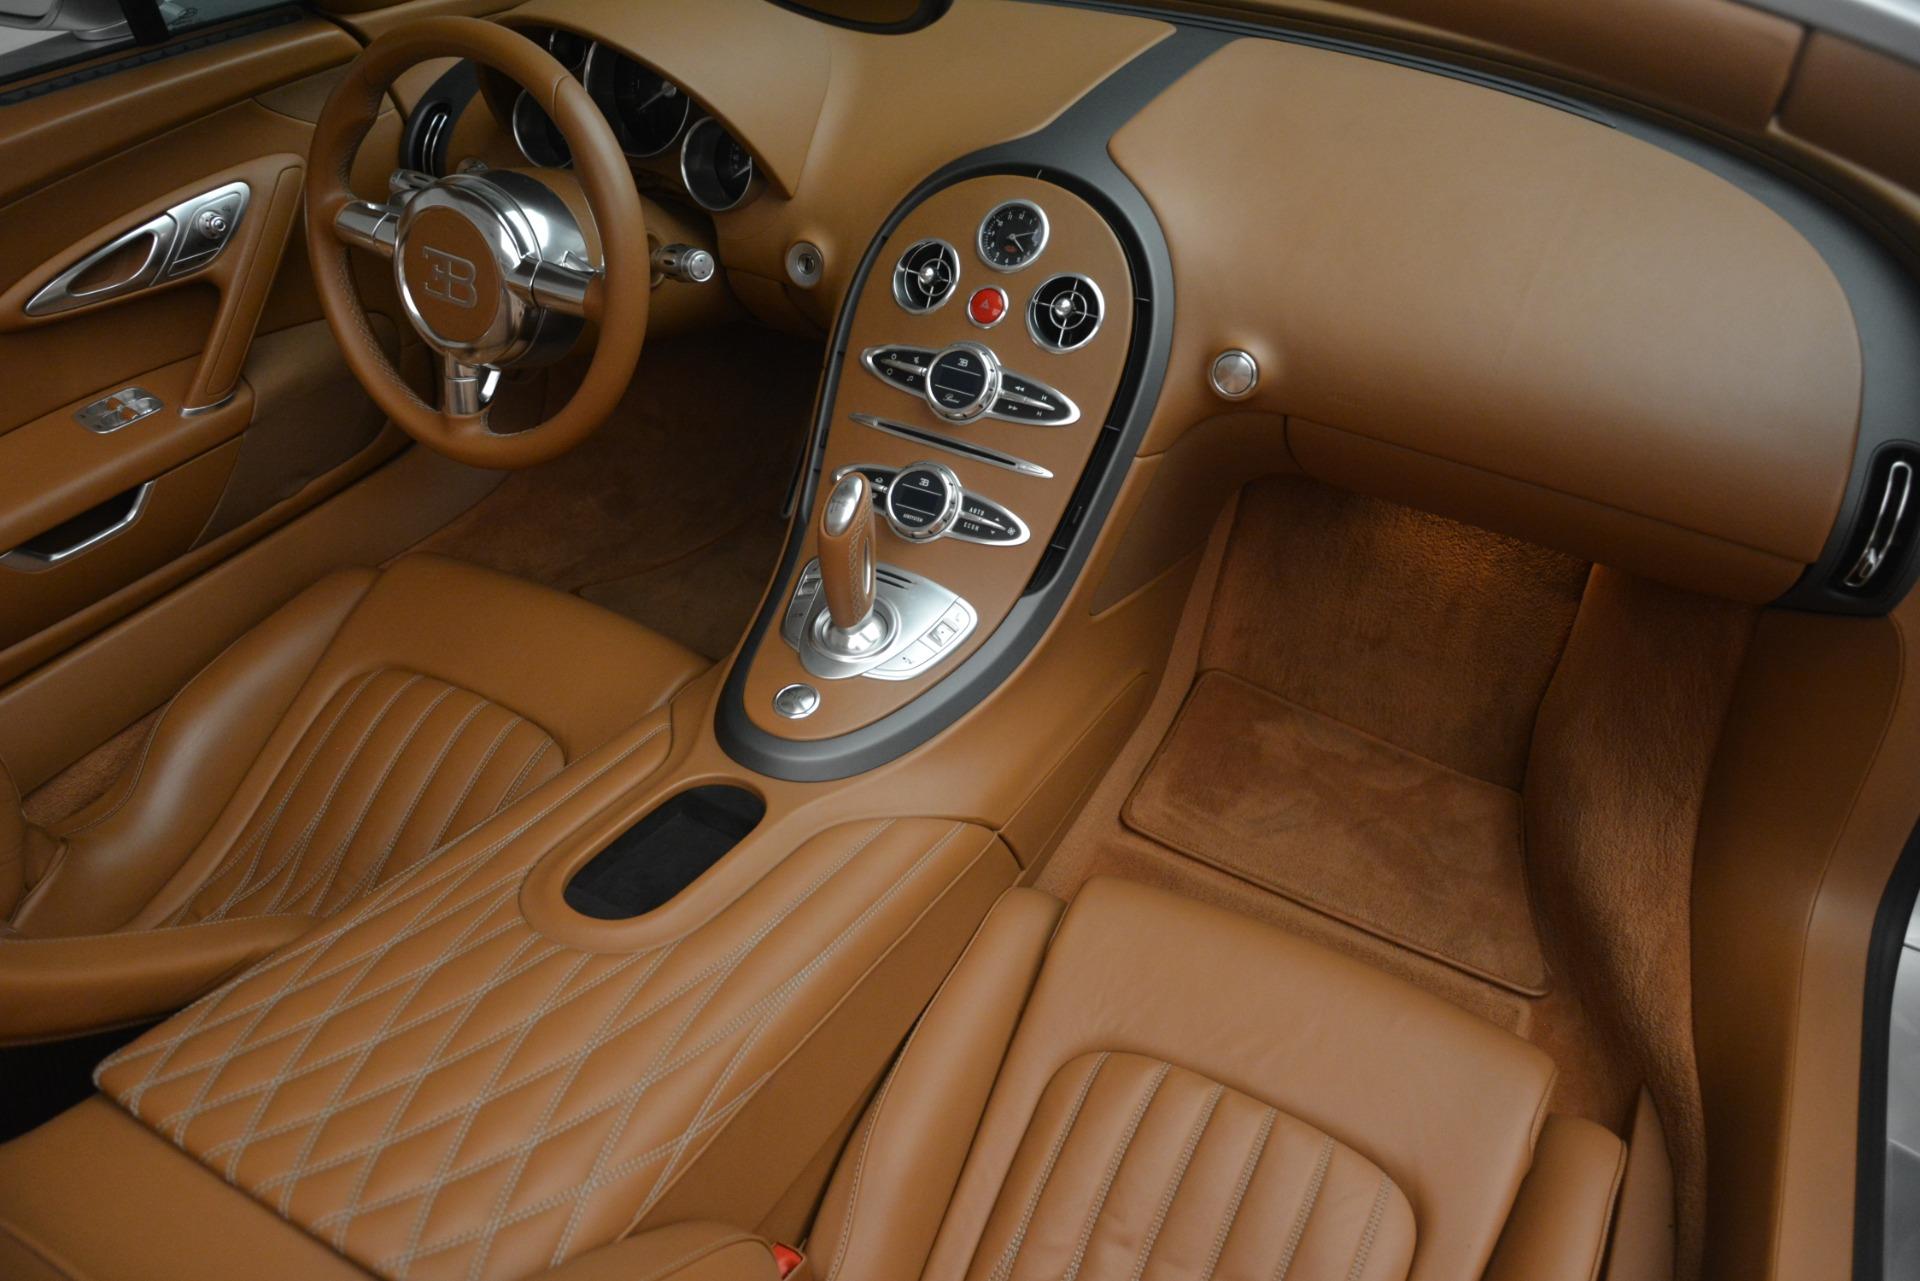 Used 2010 Bugatti Veyron 16.4 Grand Sport For Sale In Greenwich, CT 3159_p37